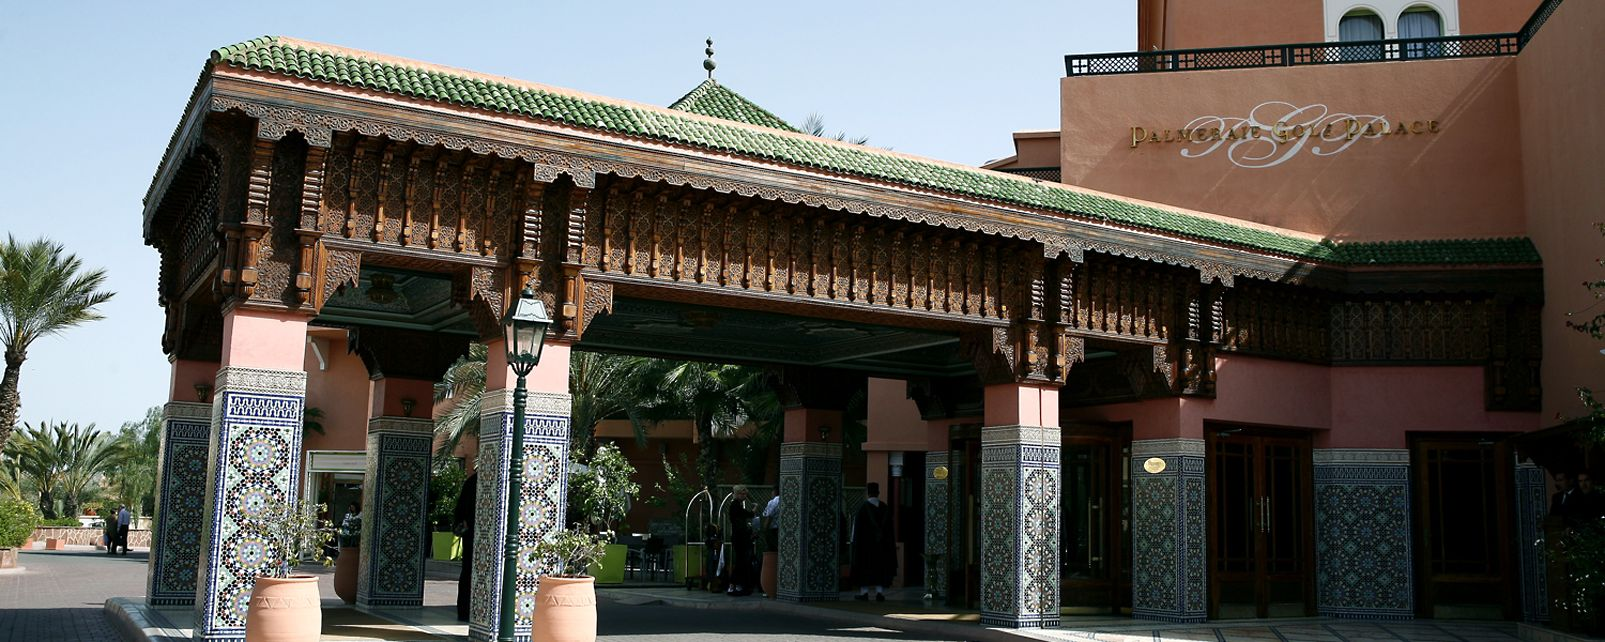 Hôtel Palmeraie Golf Palace